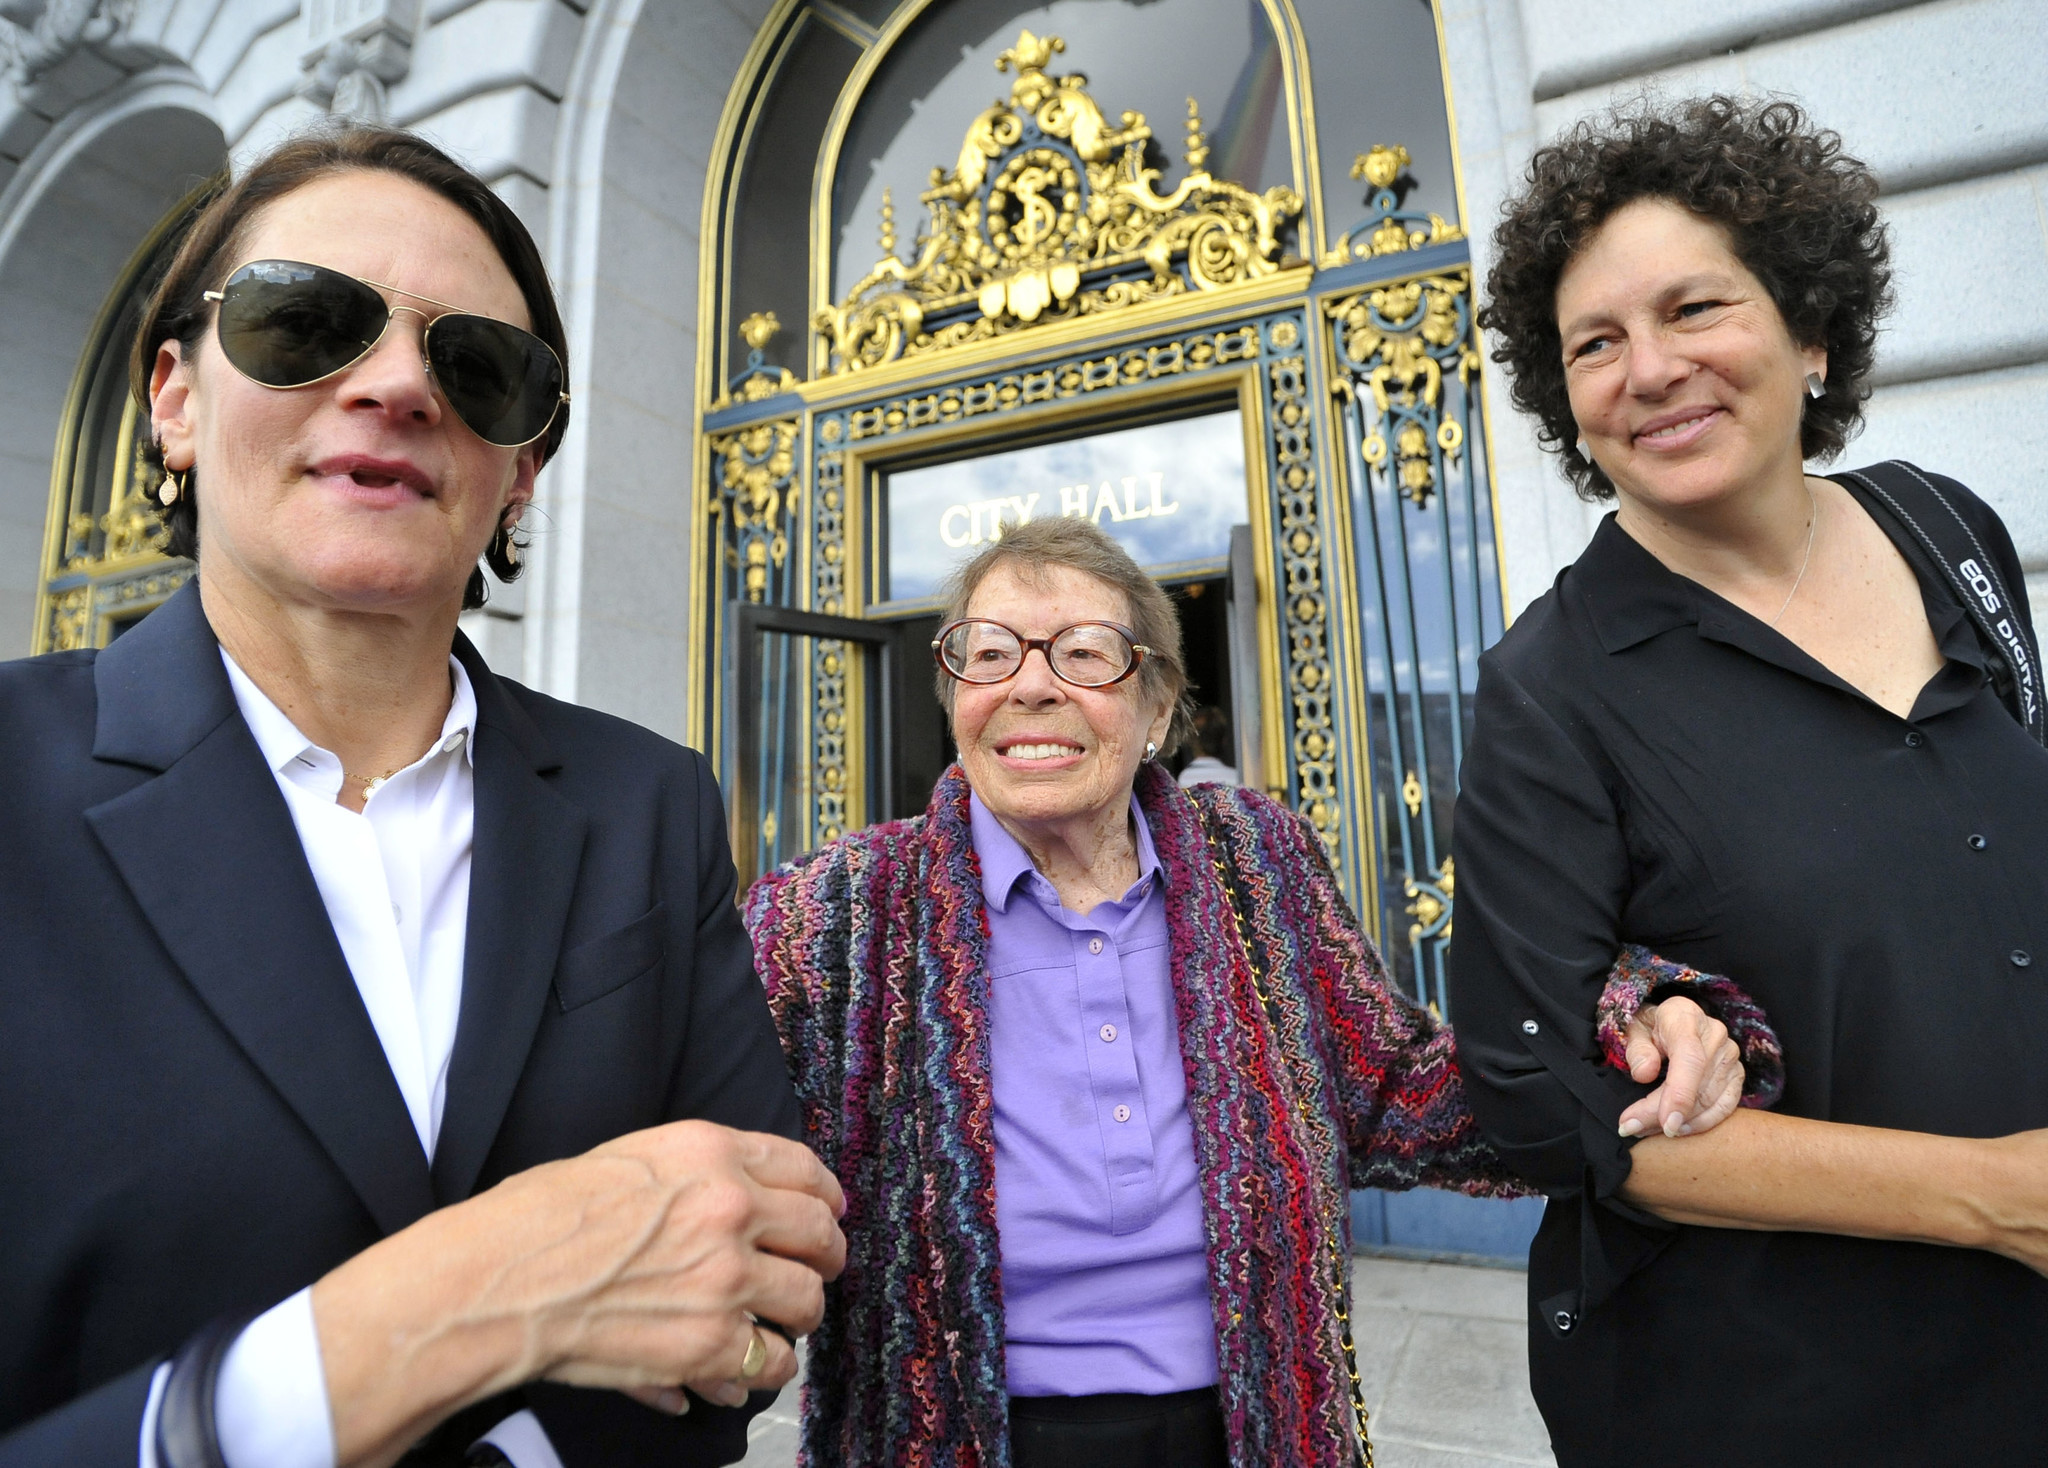 Groundbreaking LGBTQ activist Phyllis Lyon dies at age 95